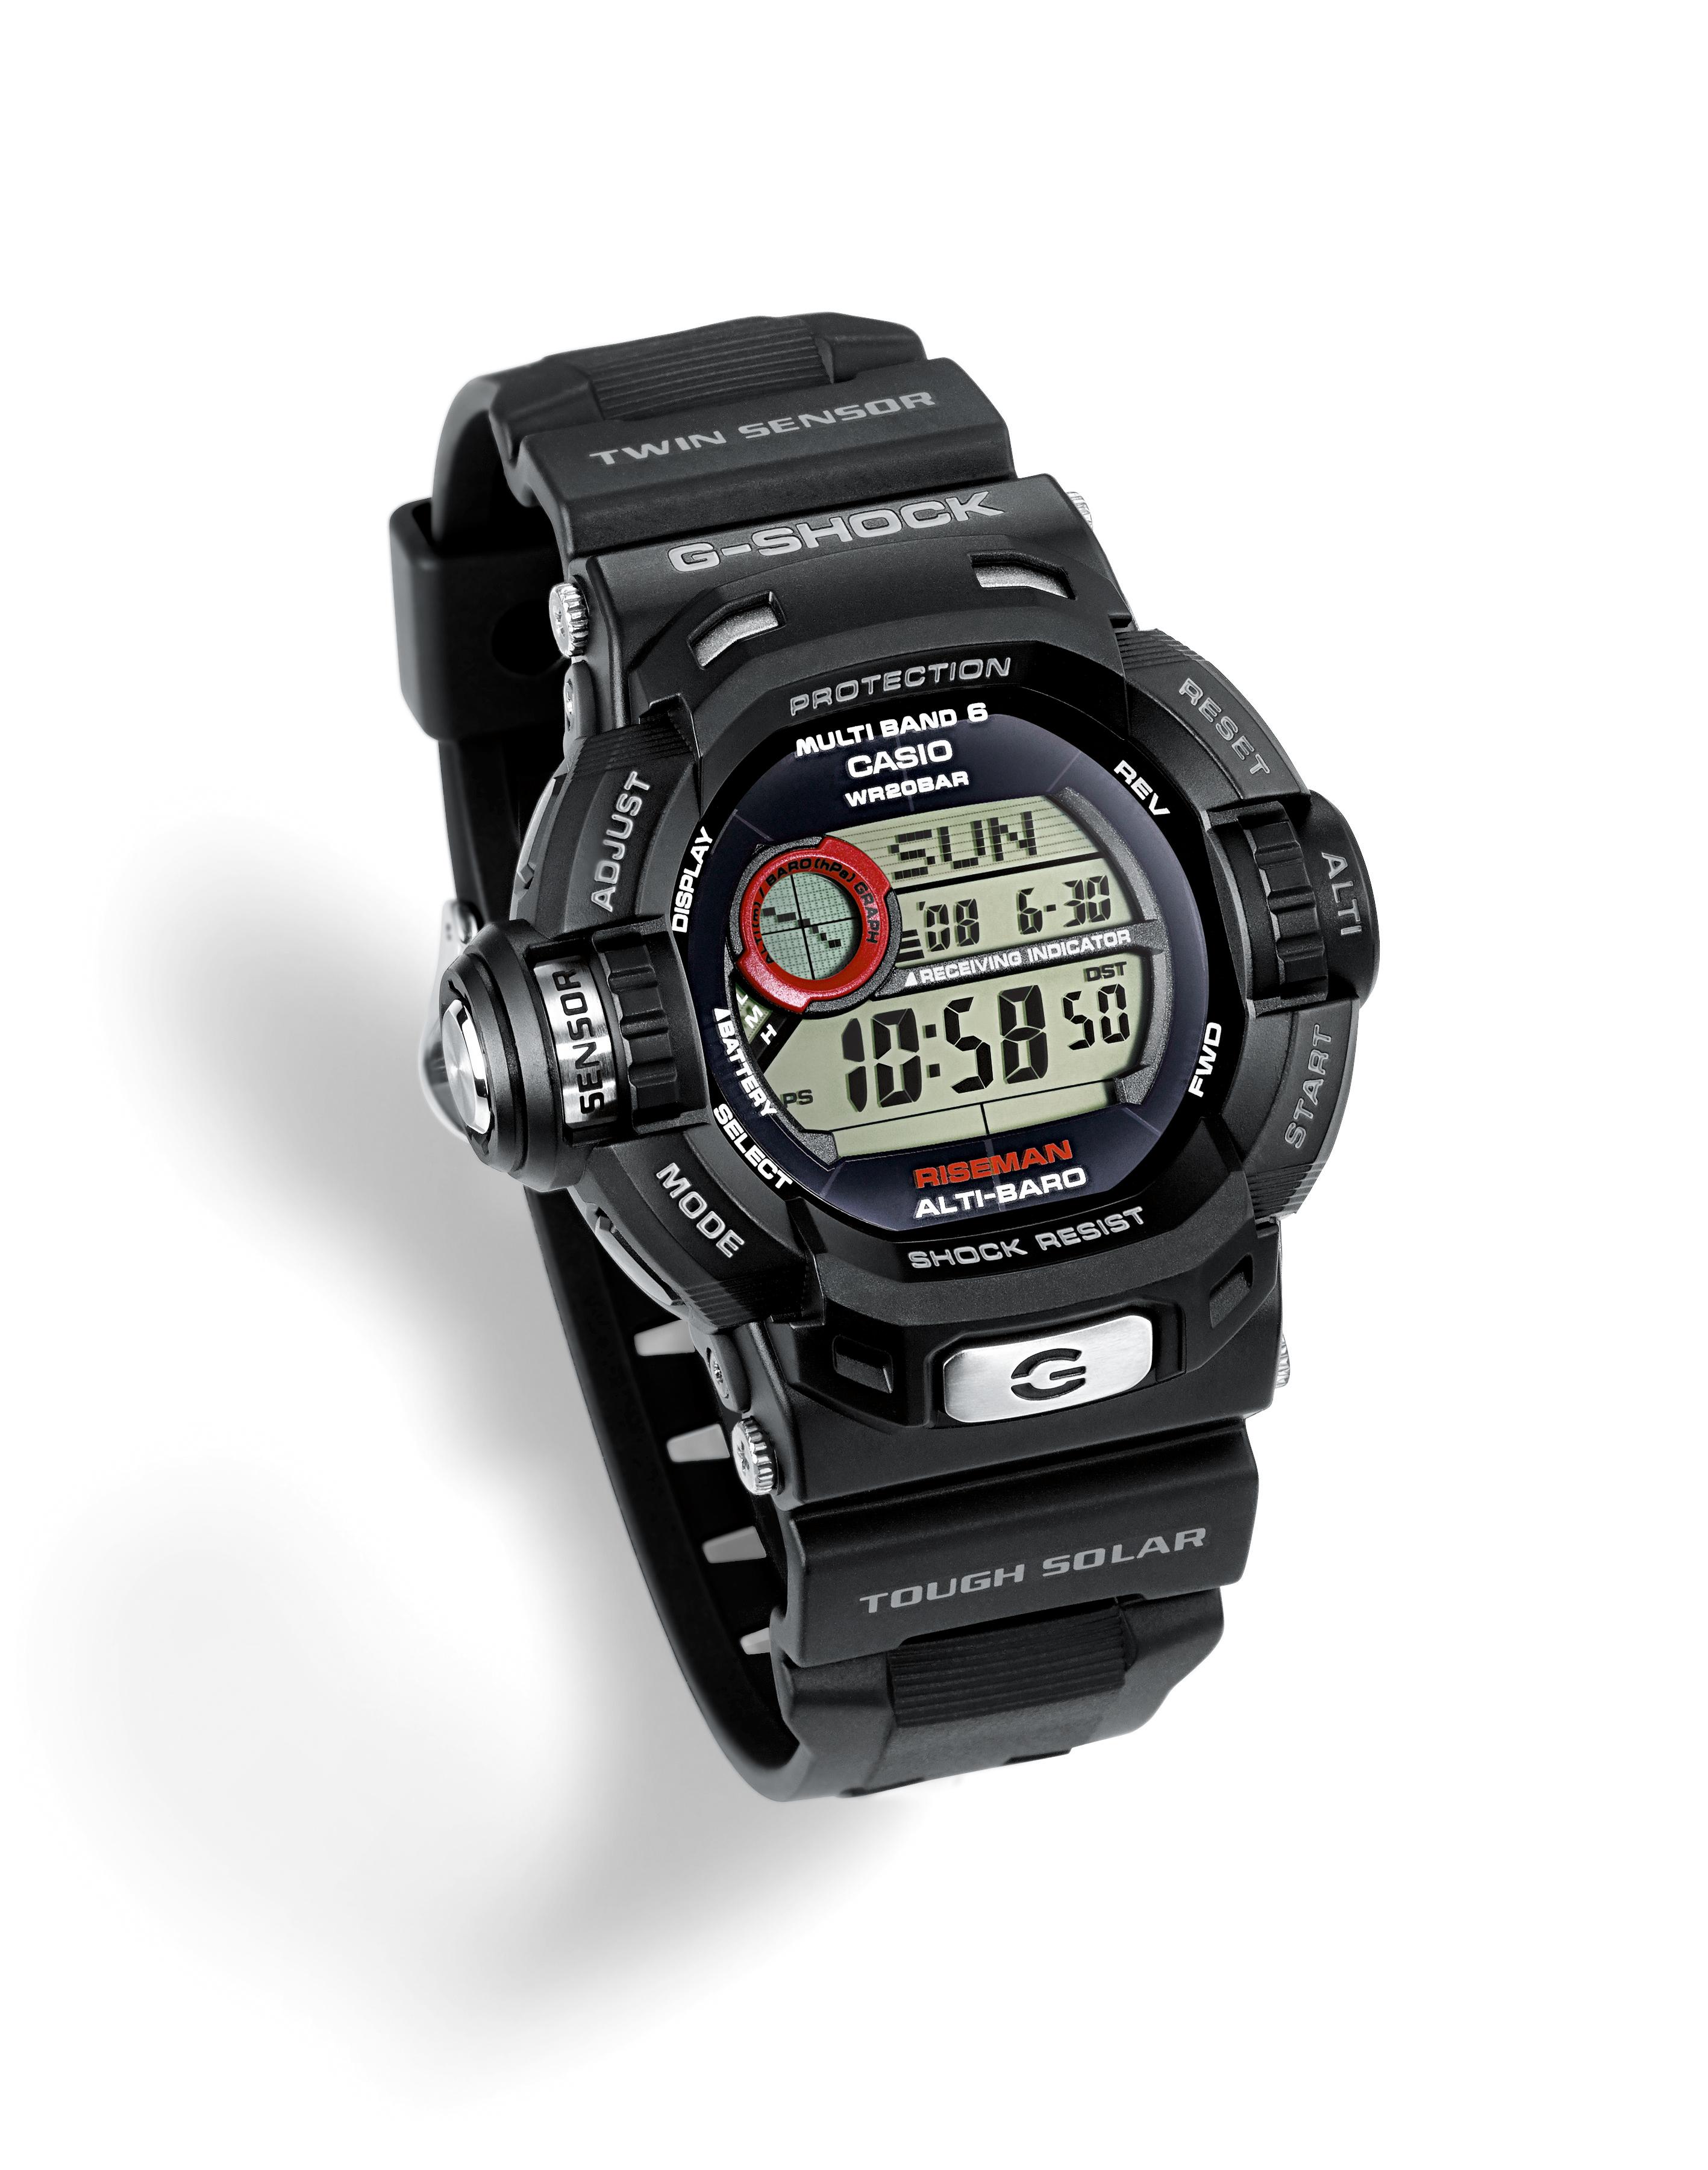 Casio GW-9200-1ER G-Shock Riseman Watch | Sustuu